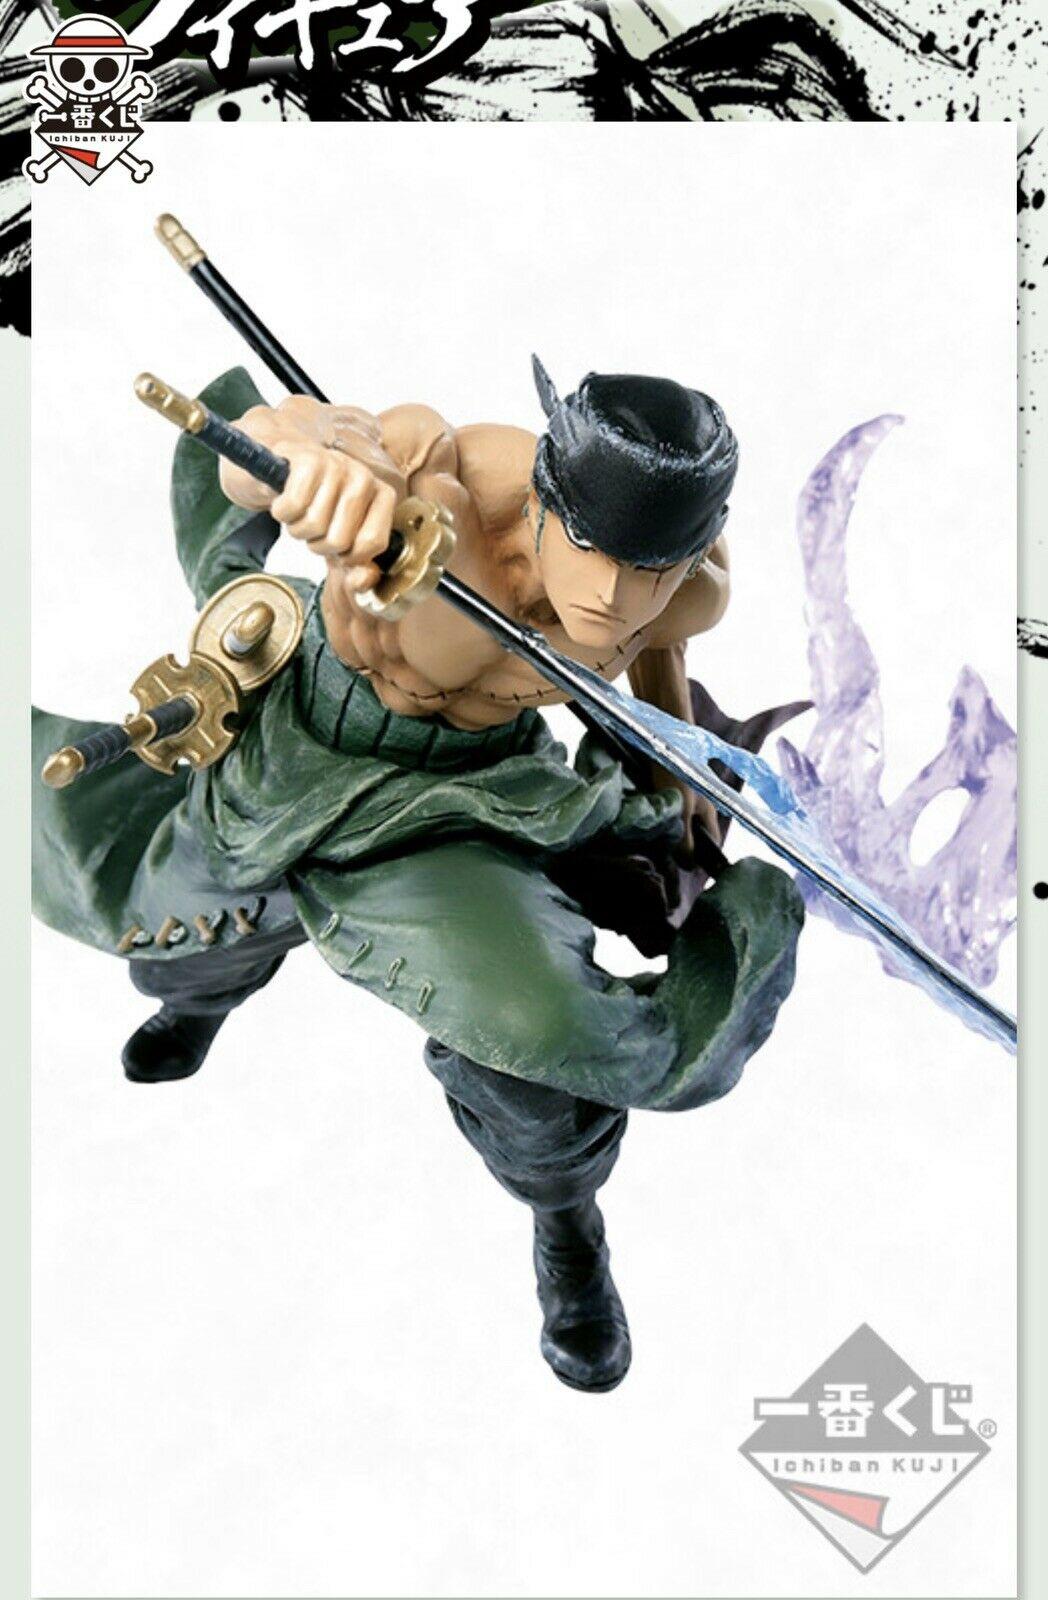 Roronoa Zoro Figure, Ichiban Kuji, Prize D, One Piece, 20th Anniversary, Bandai